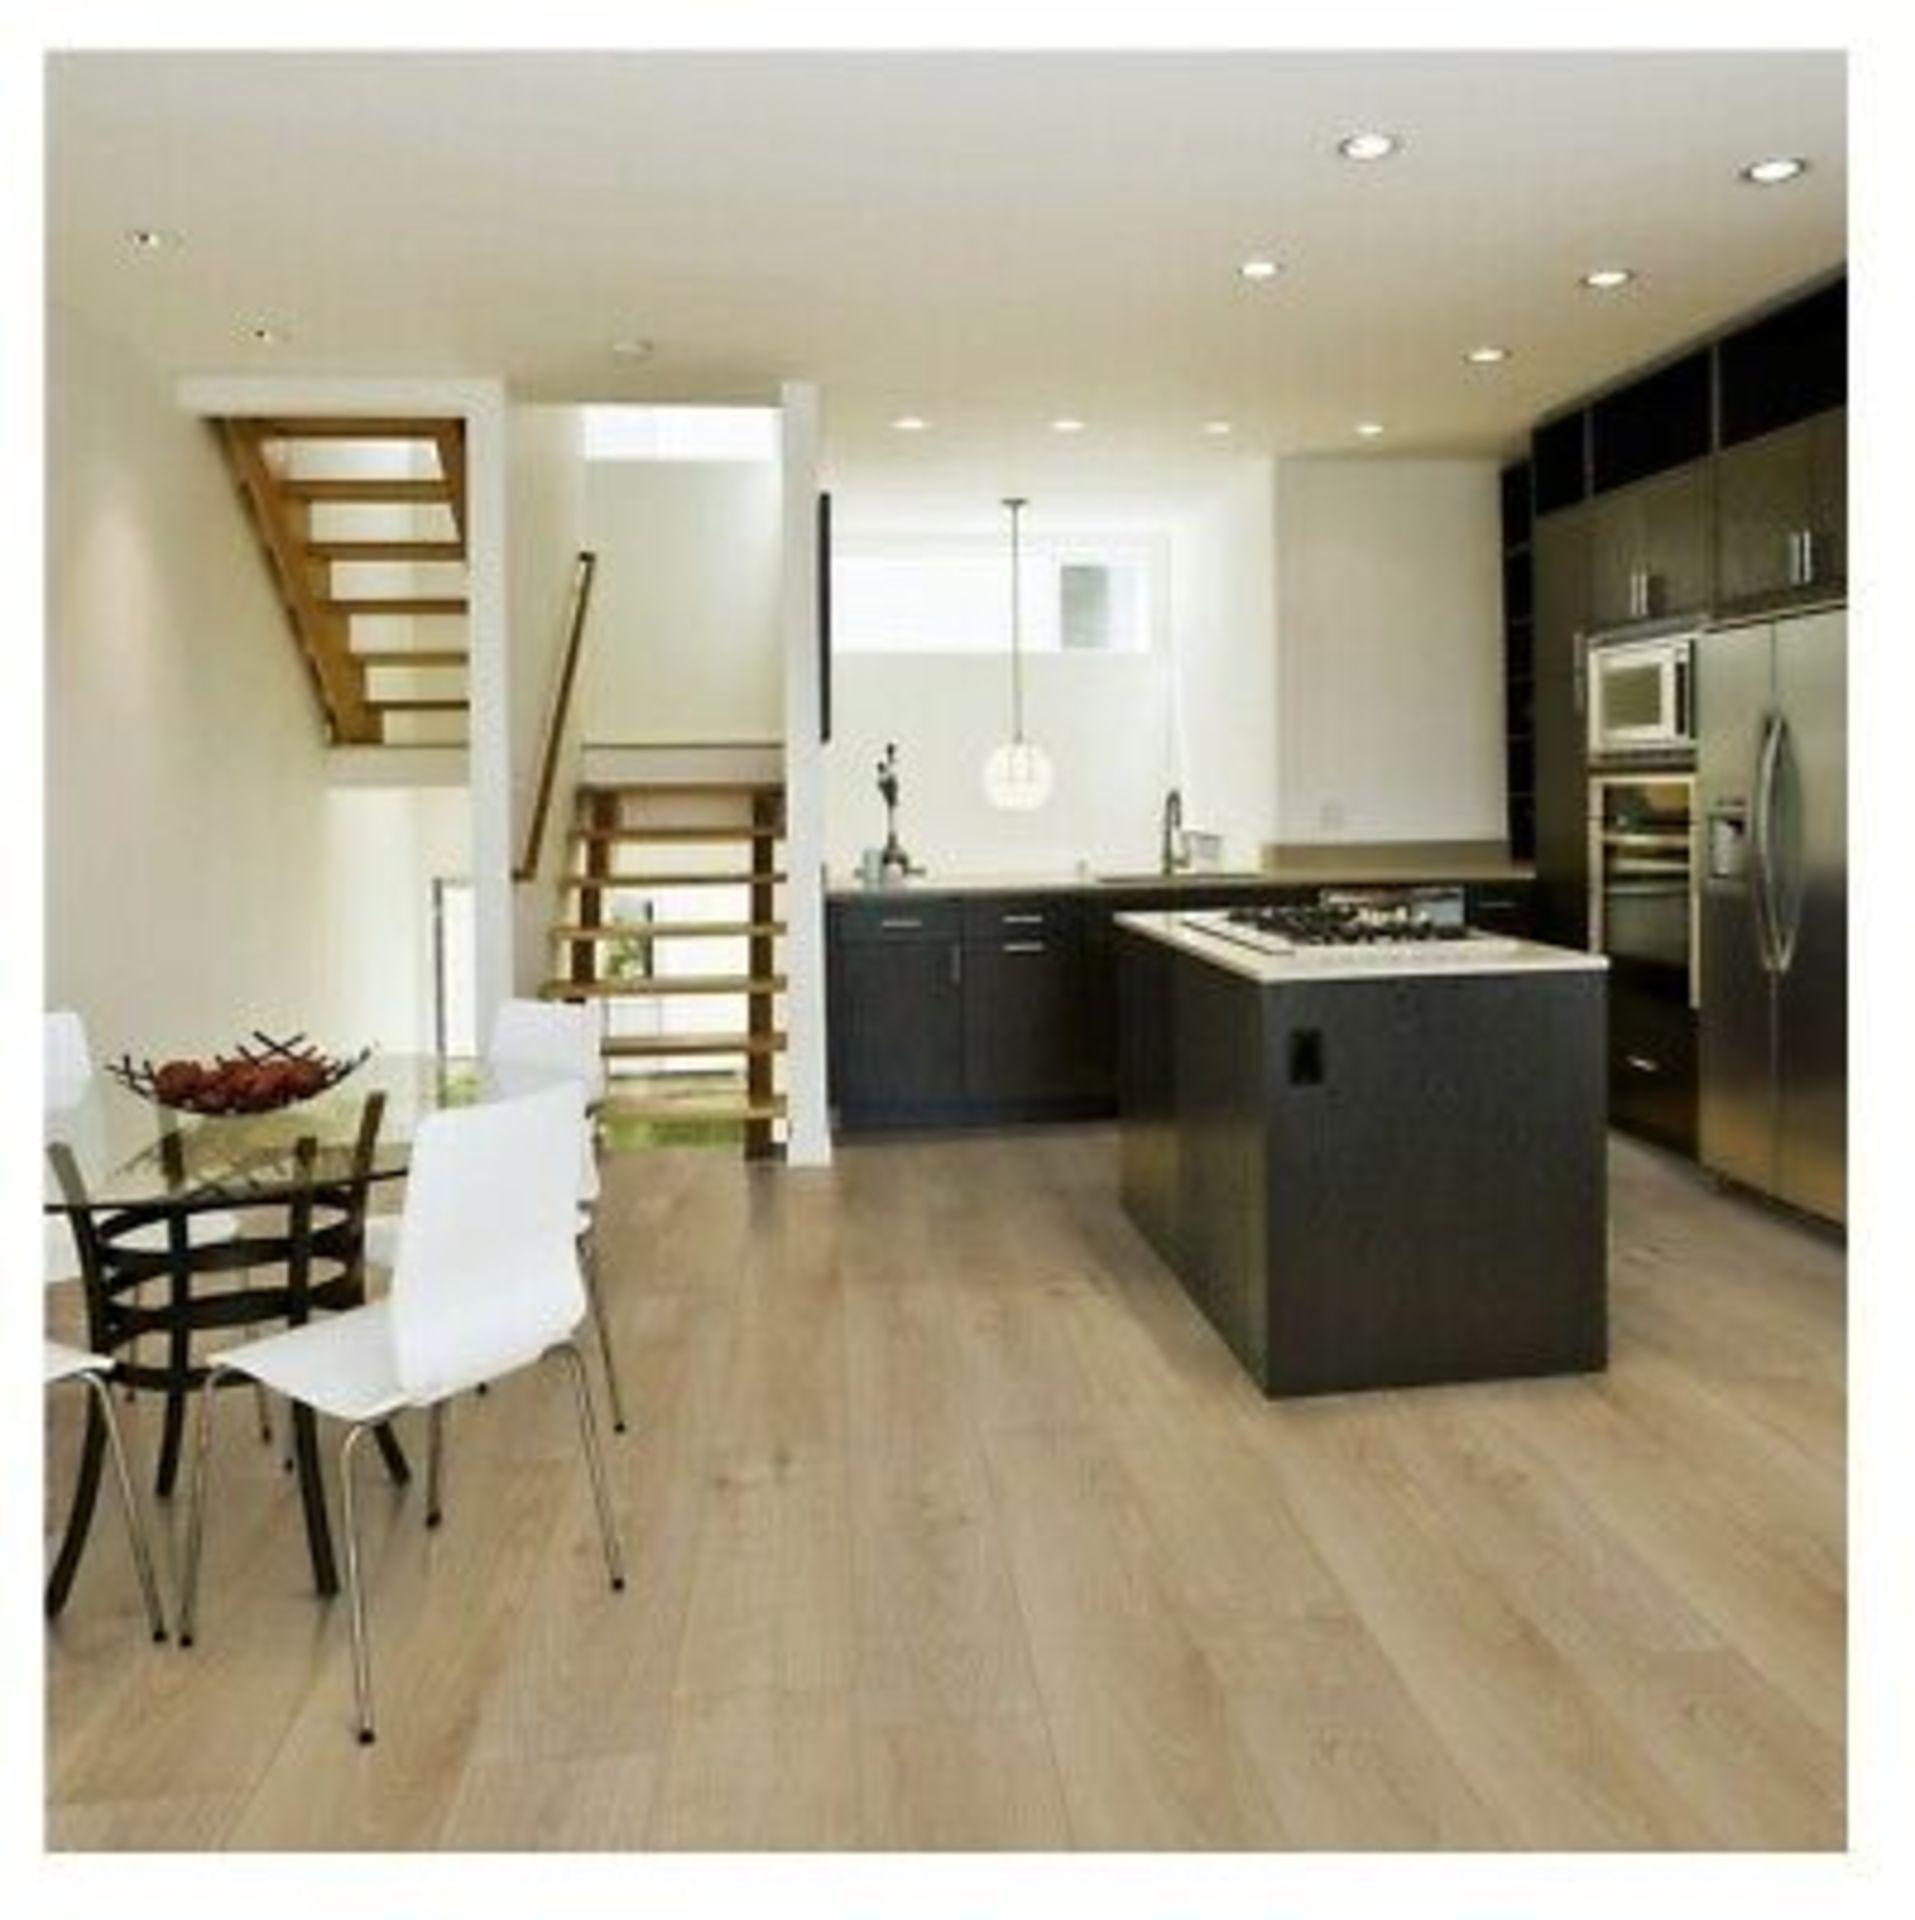 NEW 20M2 Milano oak effect Laminate flooring, 1.25m² Pack. This Overture laminate flooring offers - Image 2 of 3